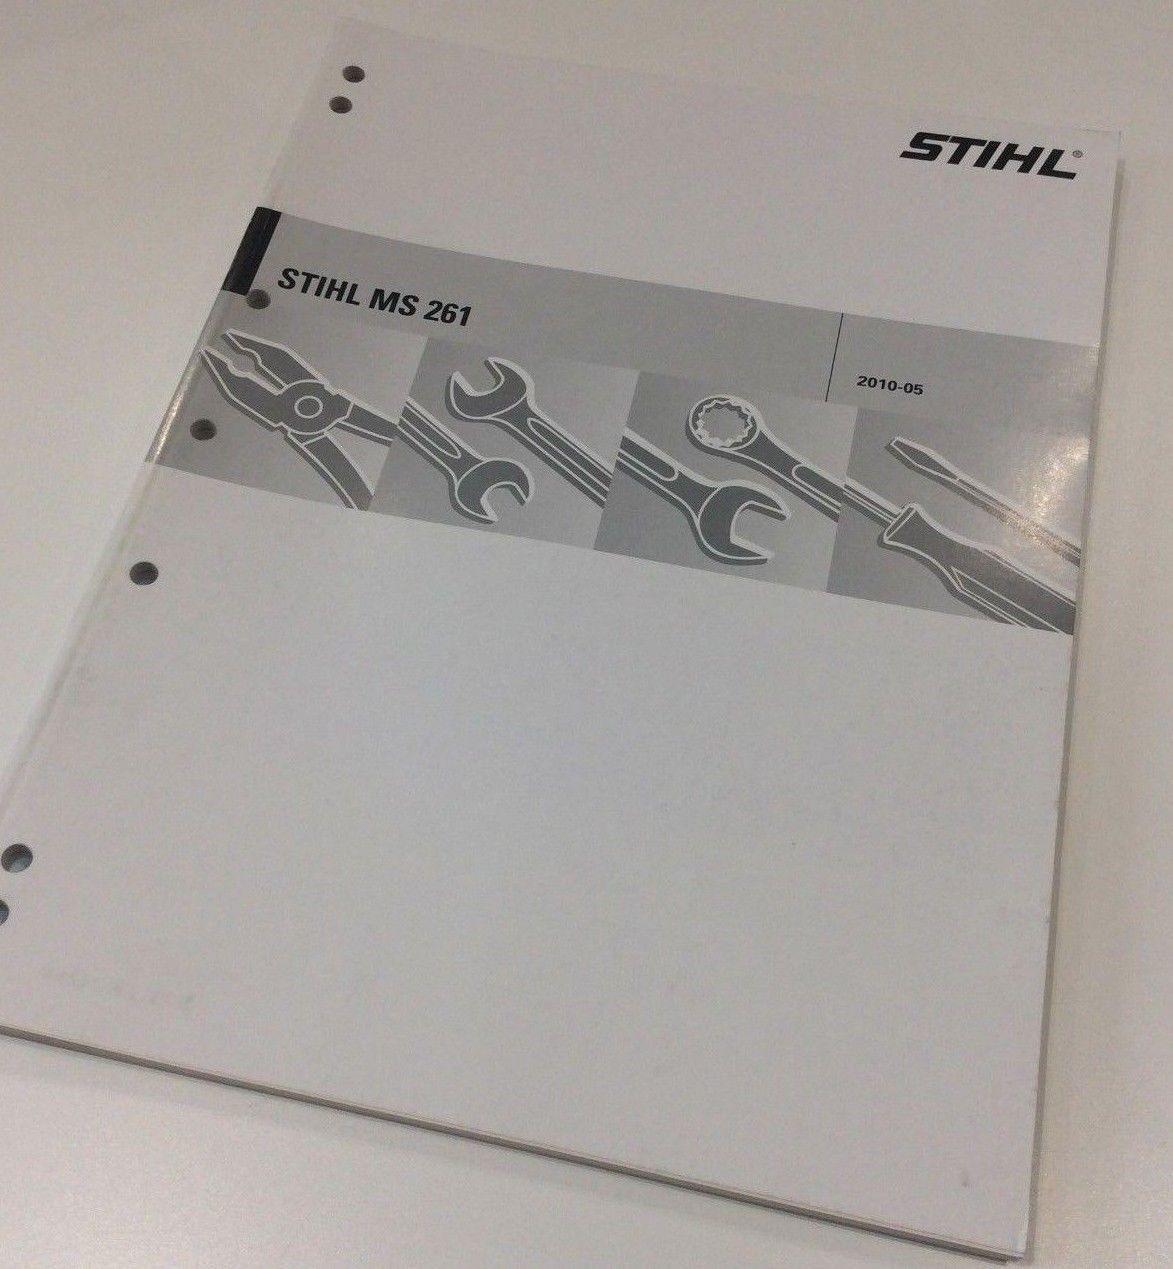 Workshop Service Manual for Stihl MS 261 - 0455 573 0123